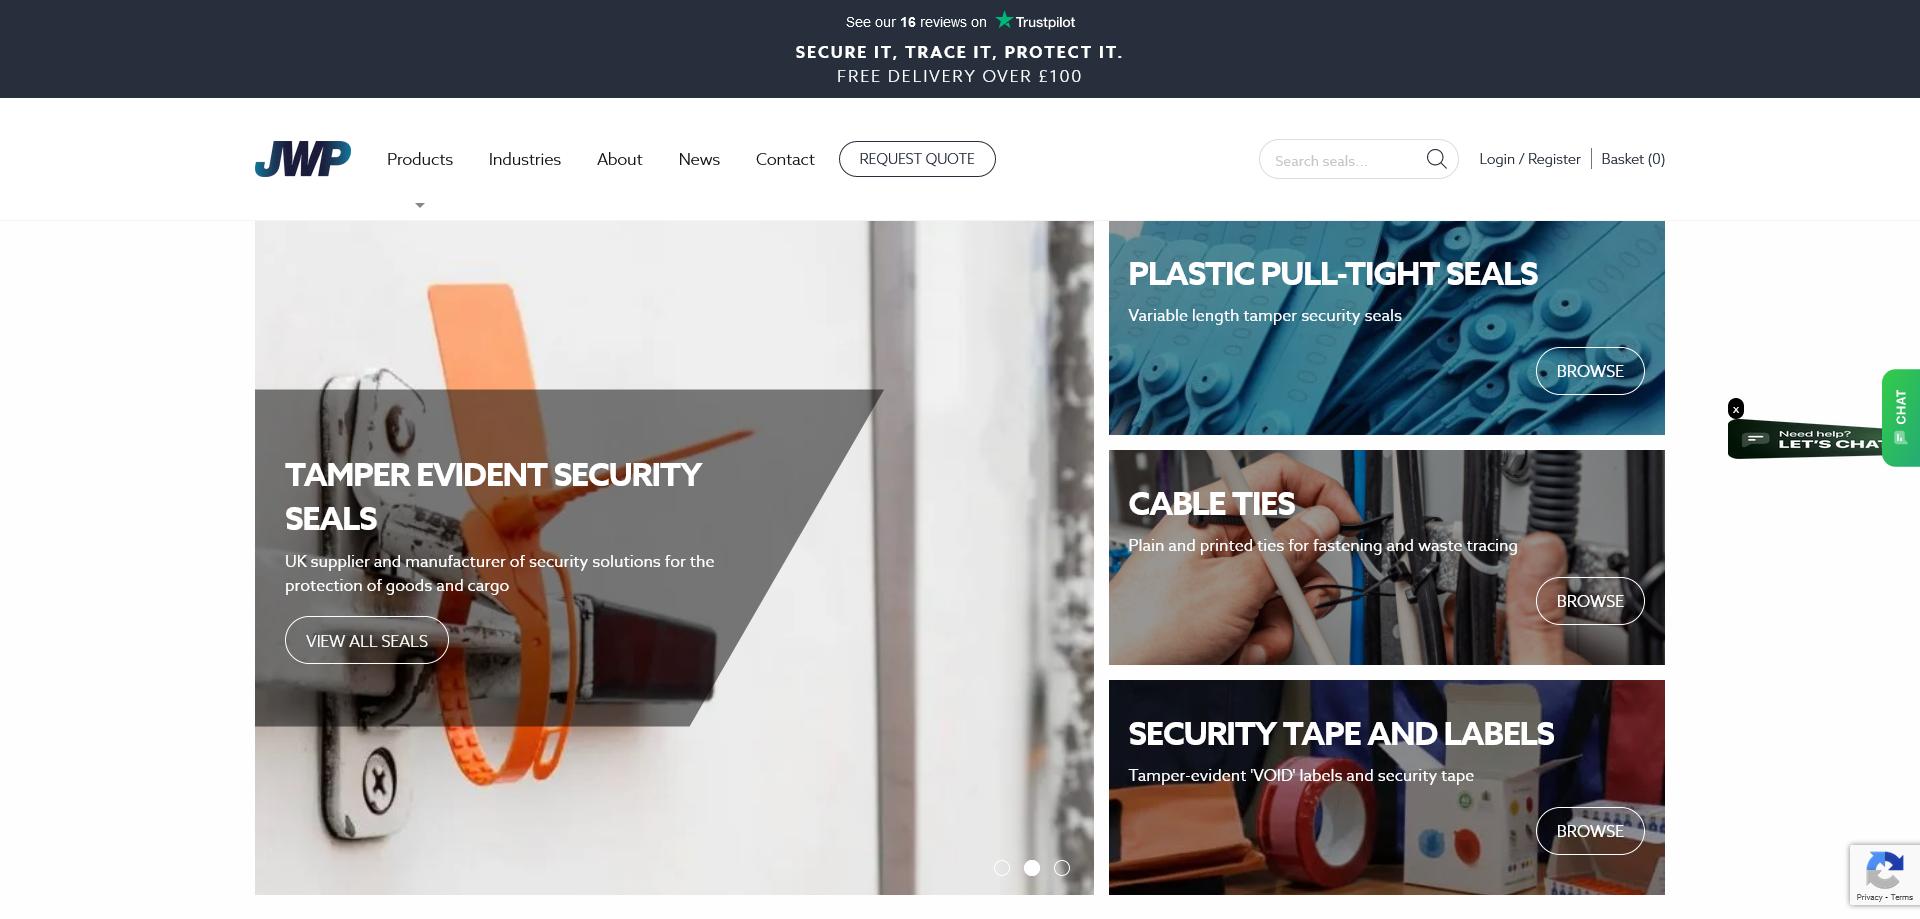 Tamper Evident Security Seals | Hubodometer London